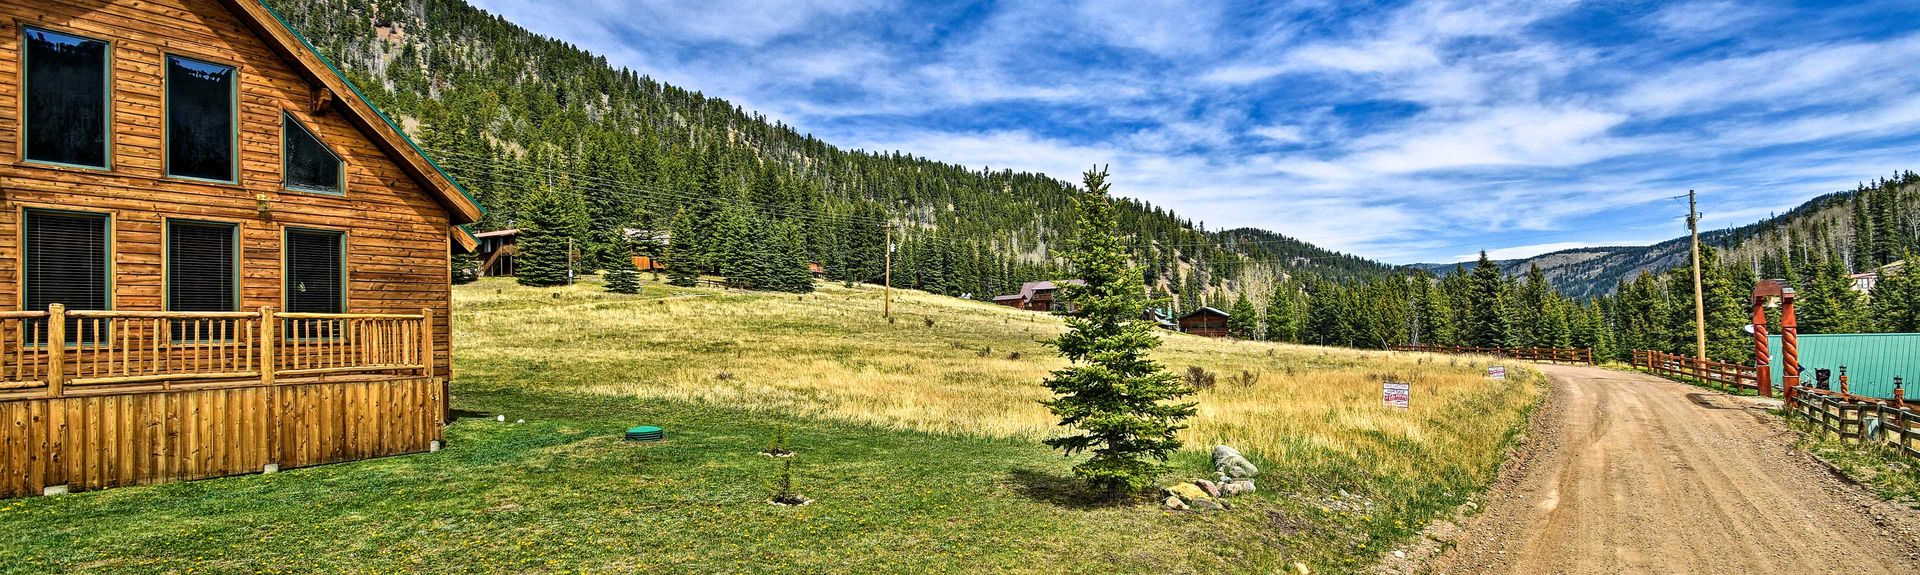 Taos Mountain Casino, Taos, NM, USA